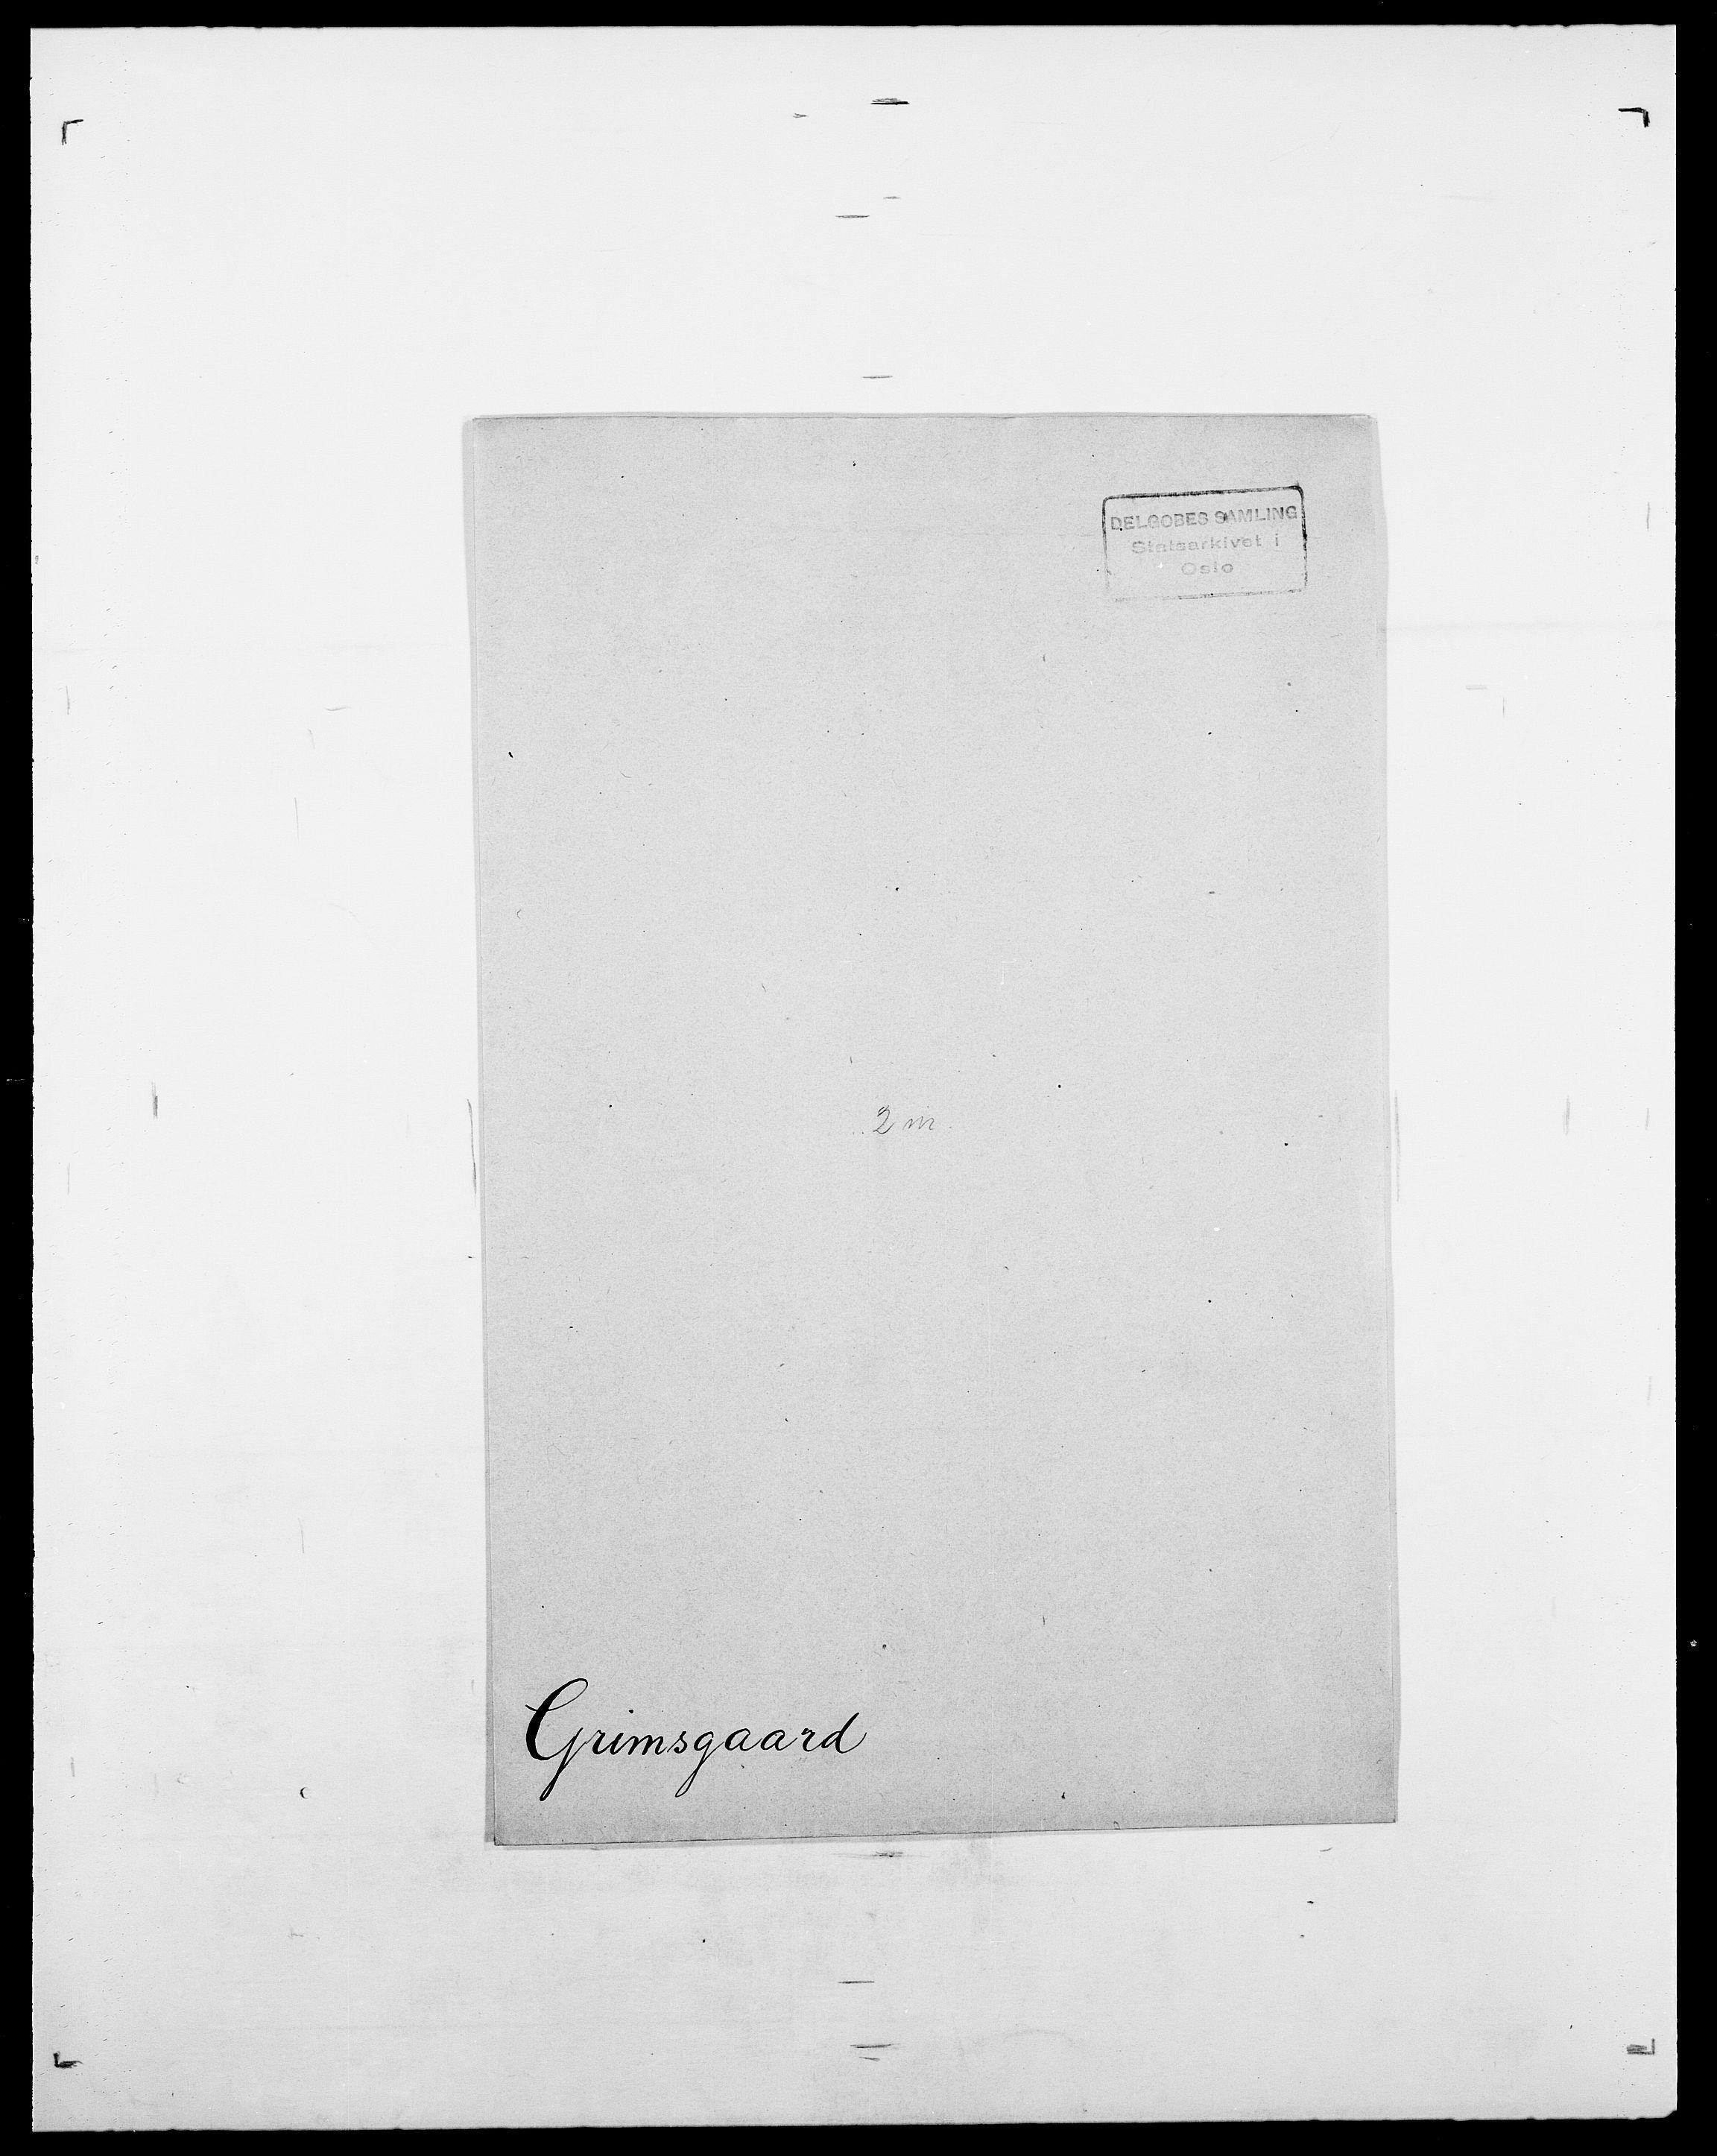 SAO, Delgobe, Charles Antoine - samling, D/Da/L0014: Giebdhausen - Grip, s. 688